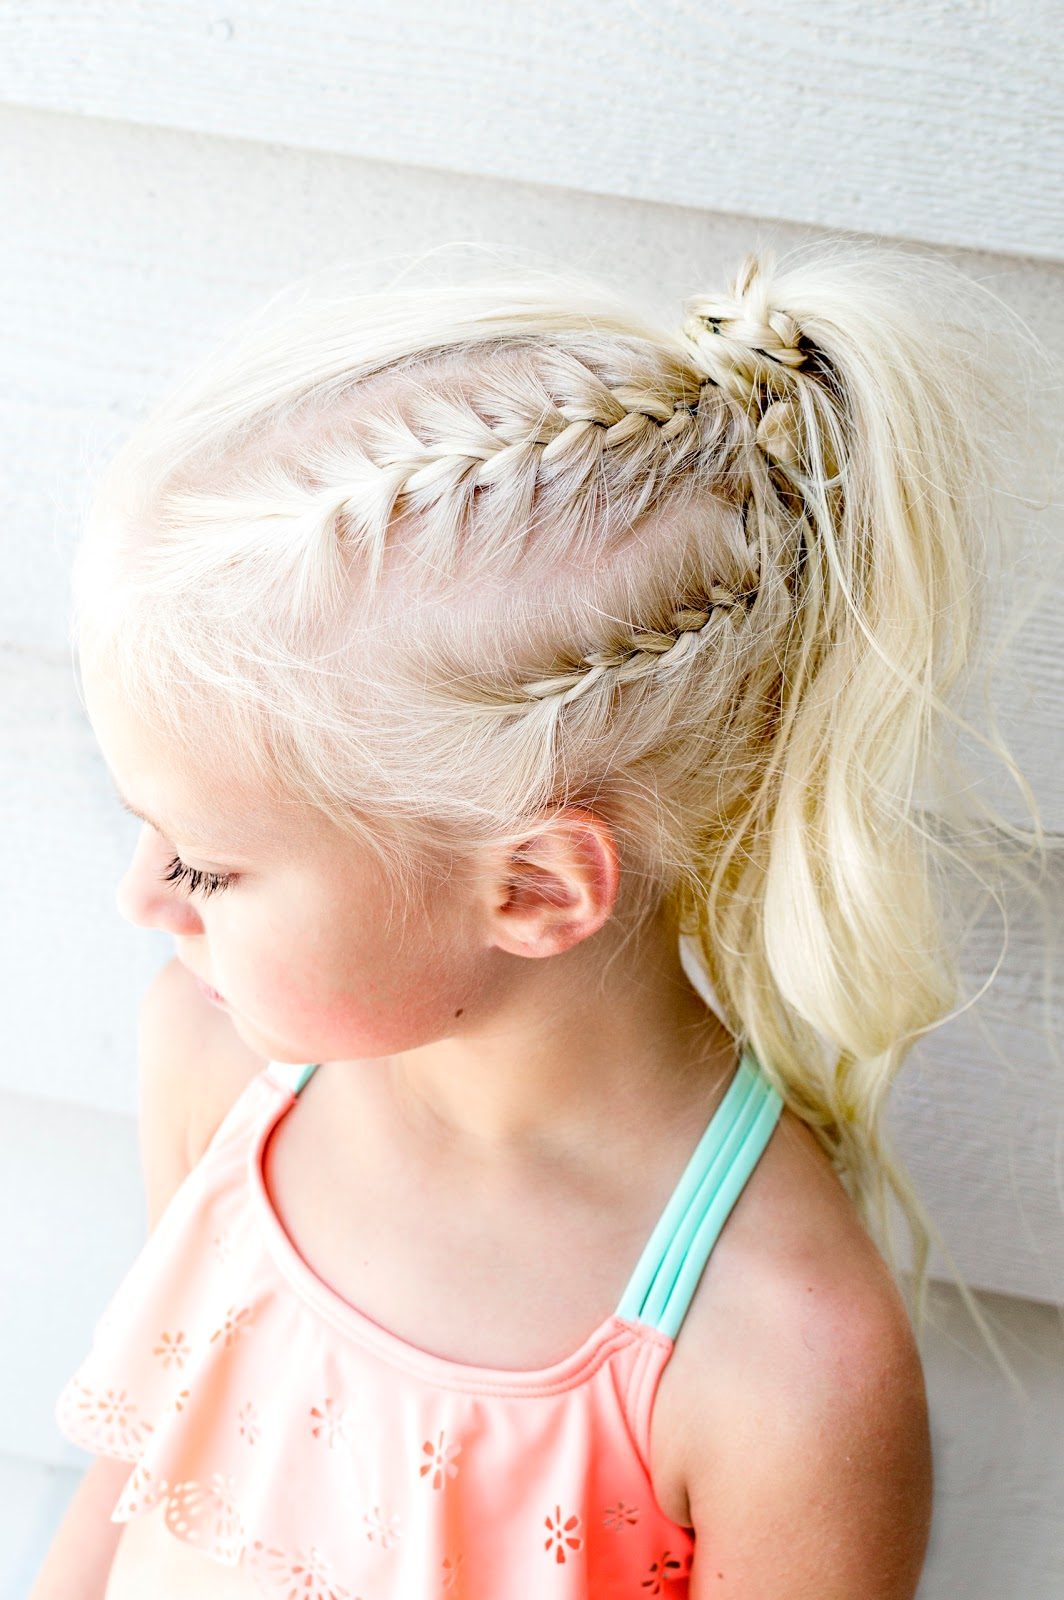 DIY Hairstyle Ideas {That Take Less Than 10 Minutes} - Daphnie Pearl